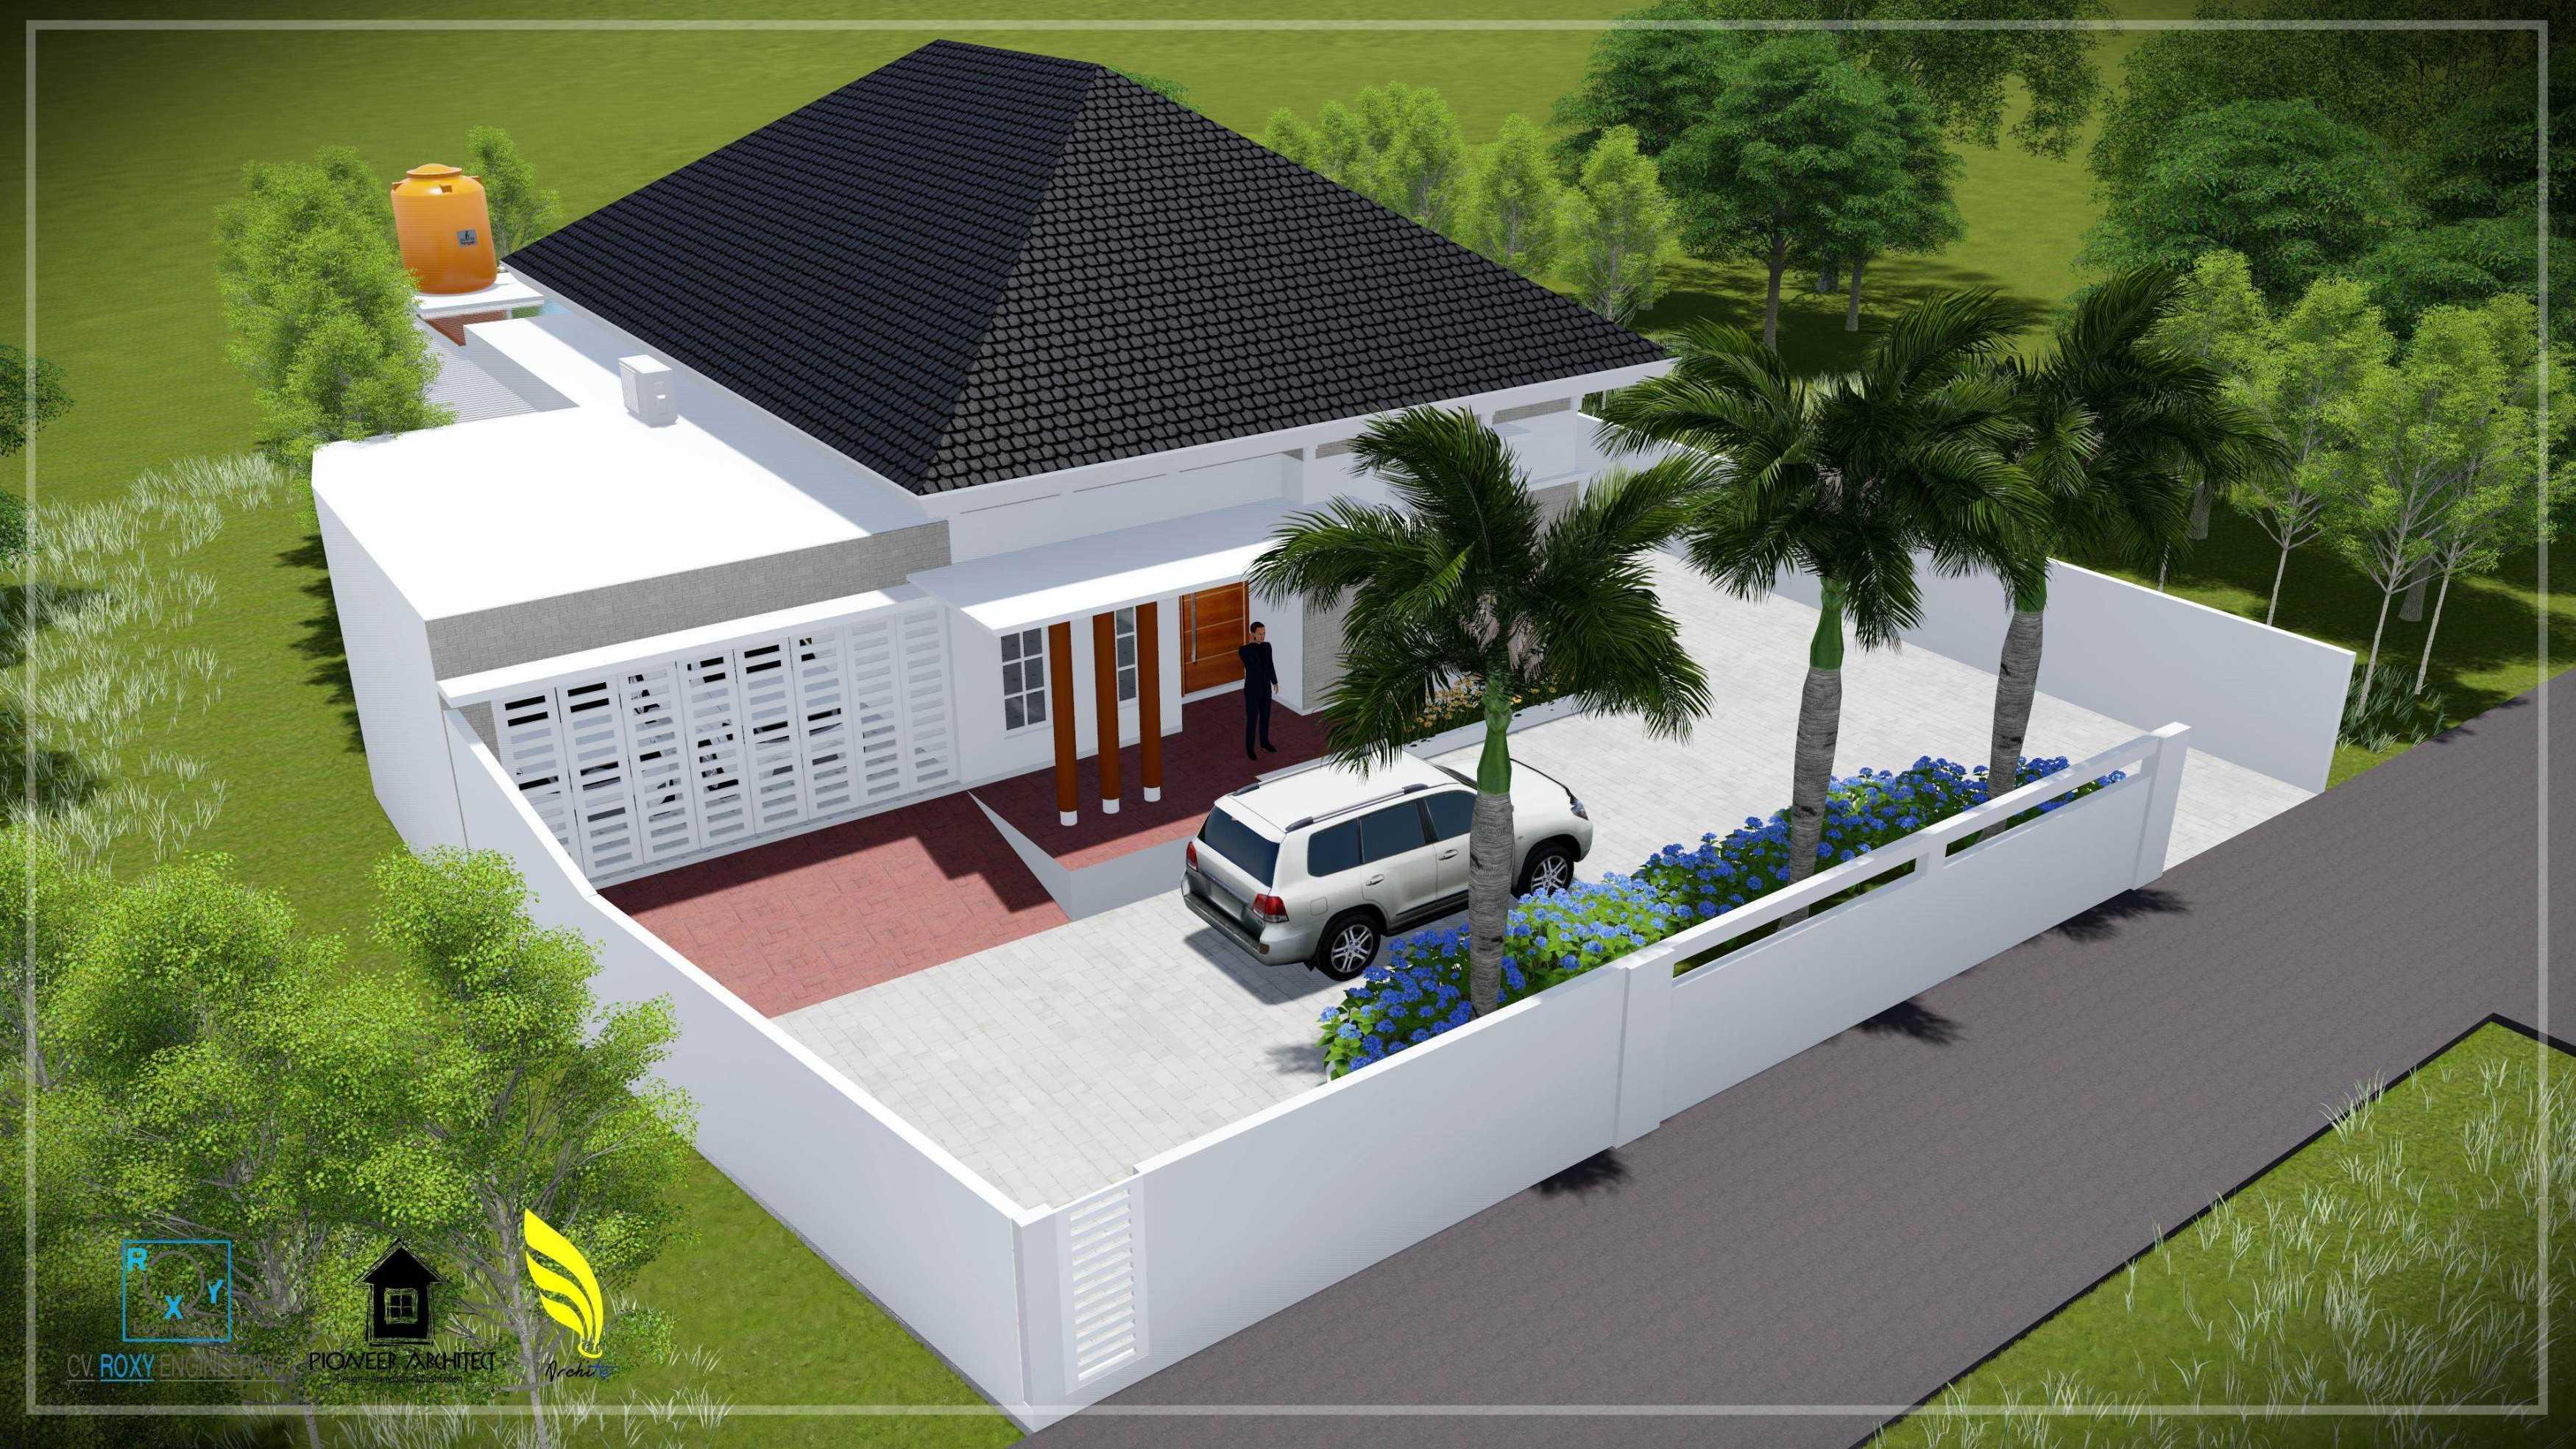 Pionner Architect Tw Modern House Banda Aceh, Kota Banda Aceh, Aceh, Indonesia Banda Aceh, Kota Banda Aceh, Aceh, Indonesia Bird Eye View   43271